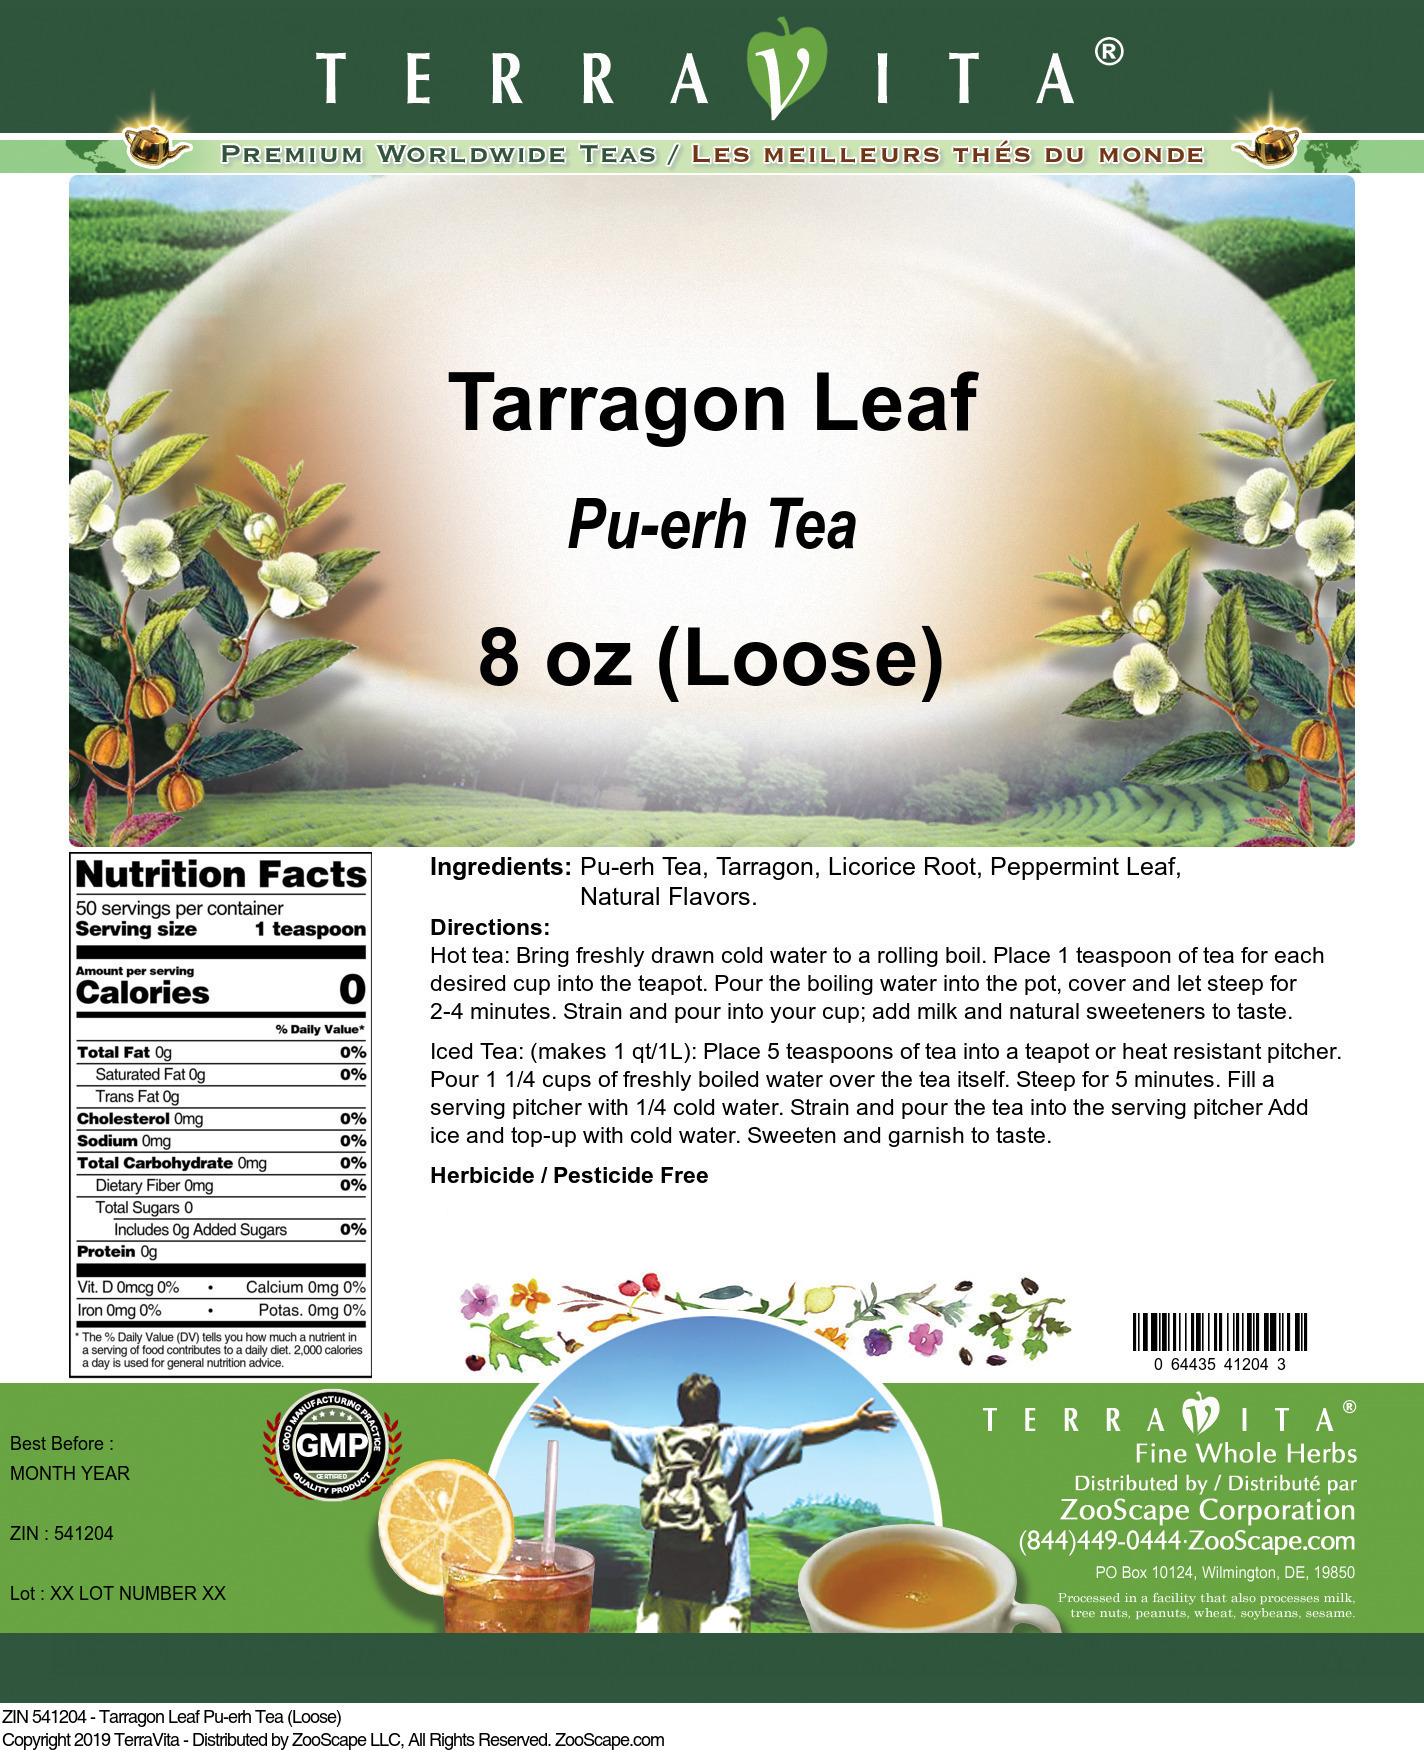 Tarragon Leaf Pu-erh Tea (Loose)